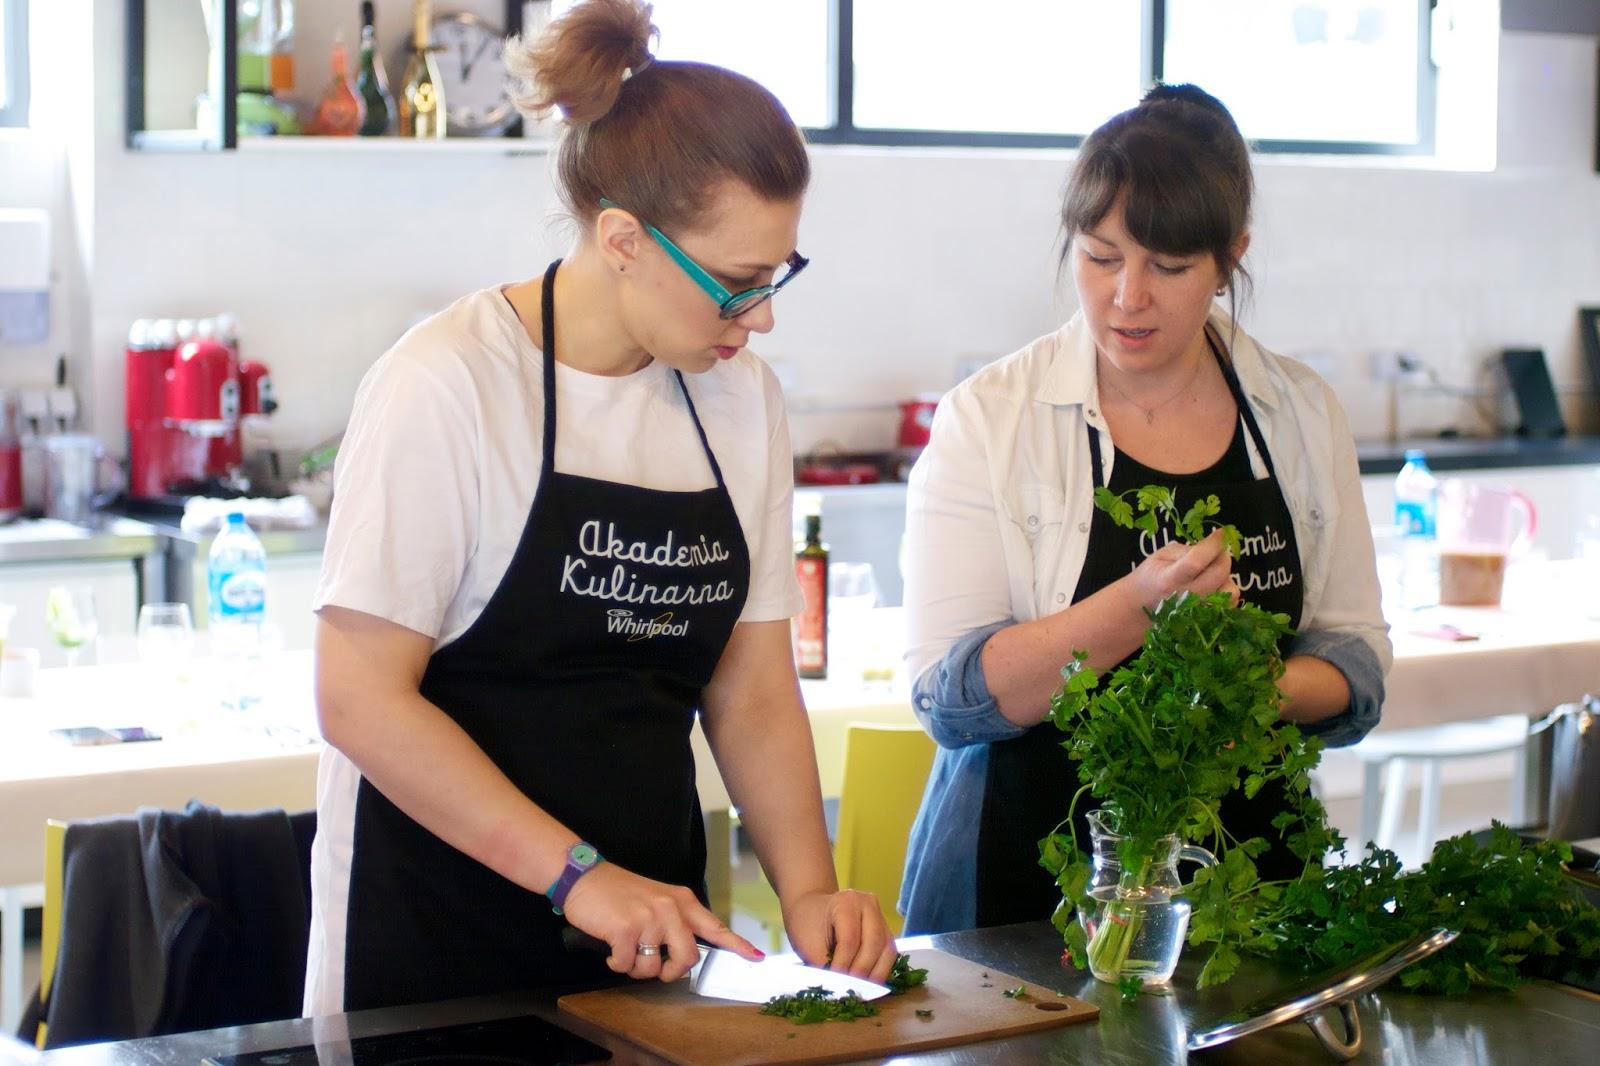 akademia kulinarna whirpool warsztaty